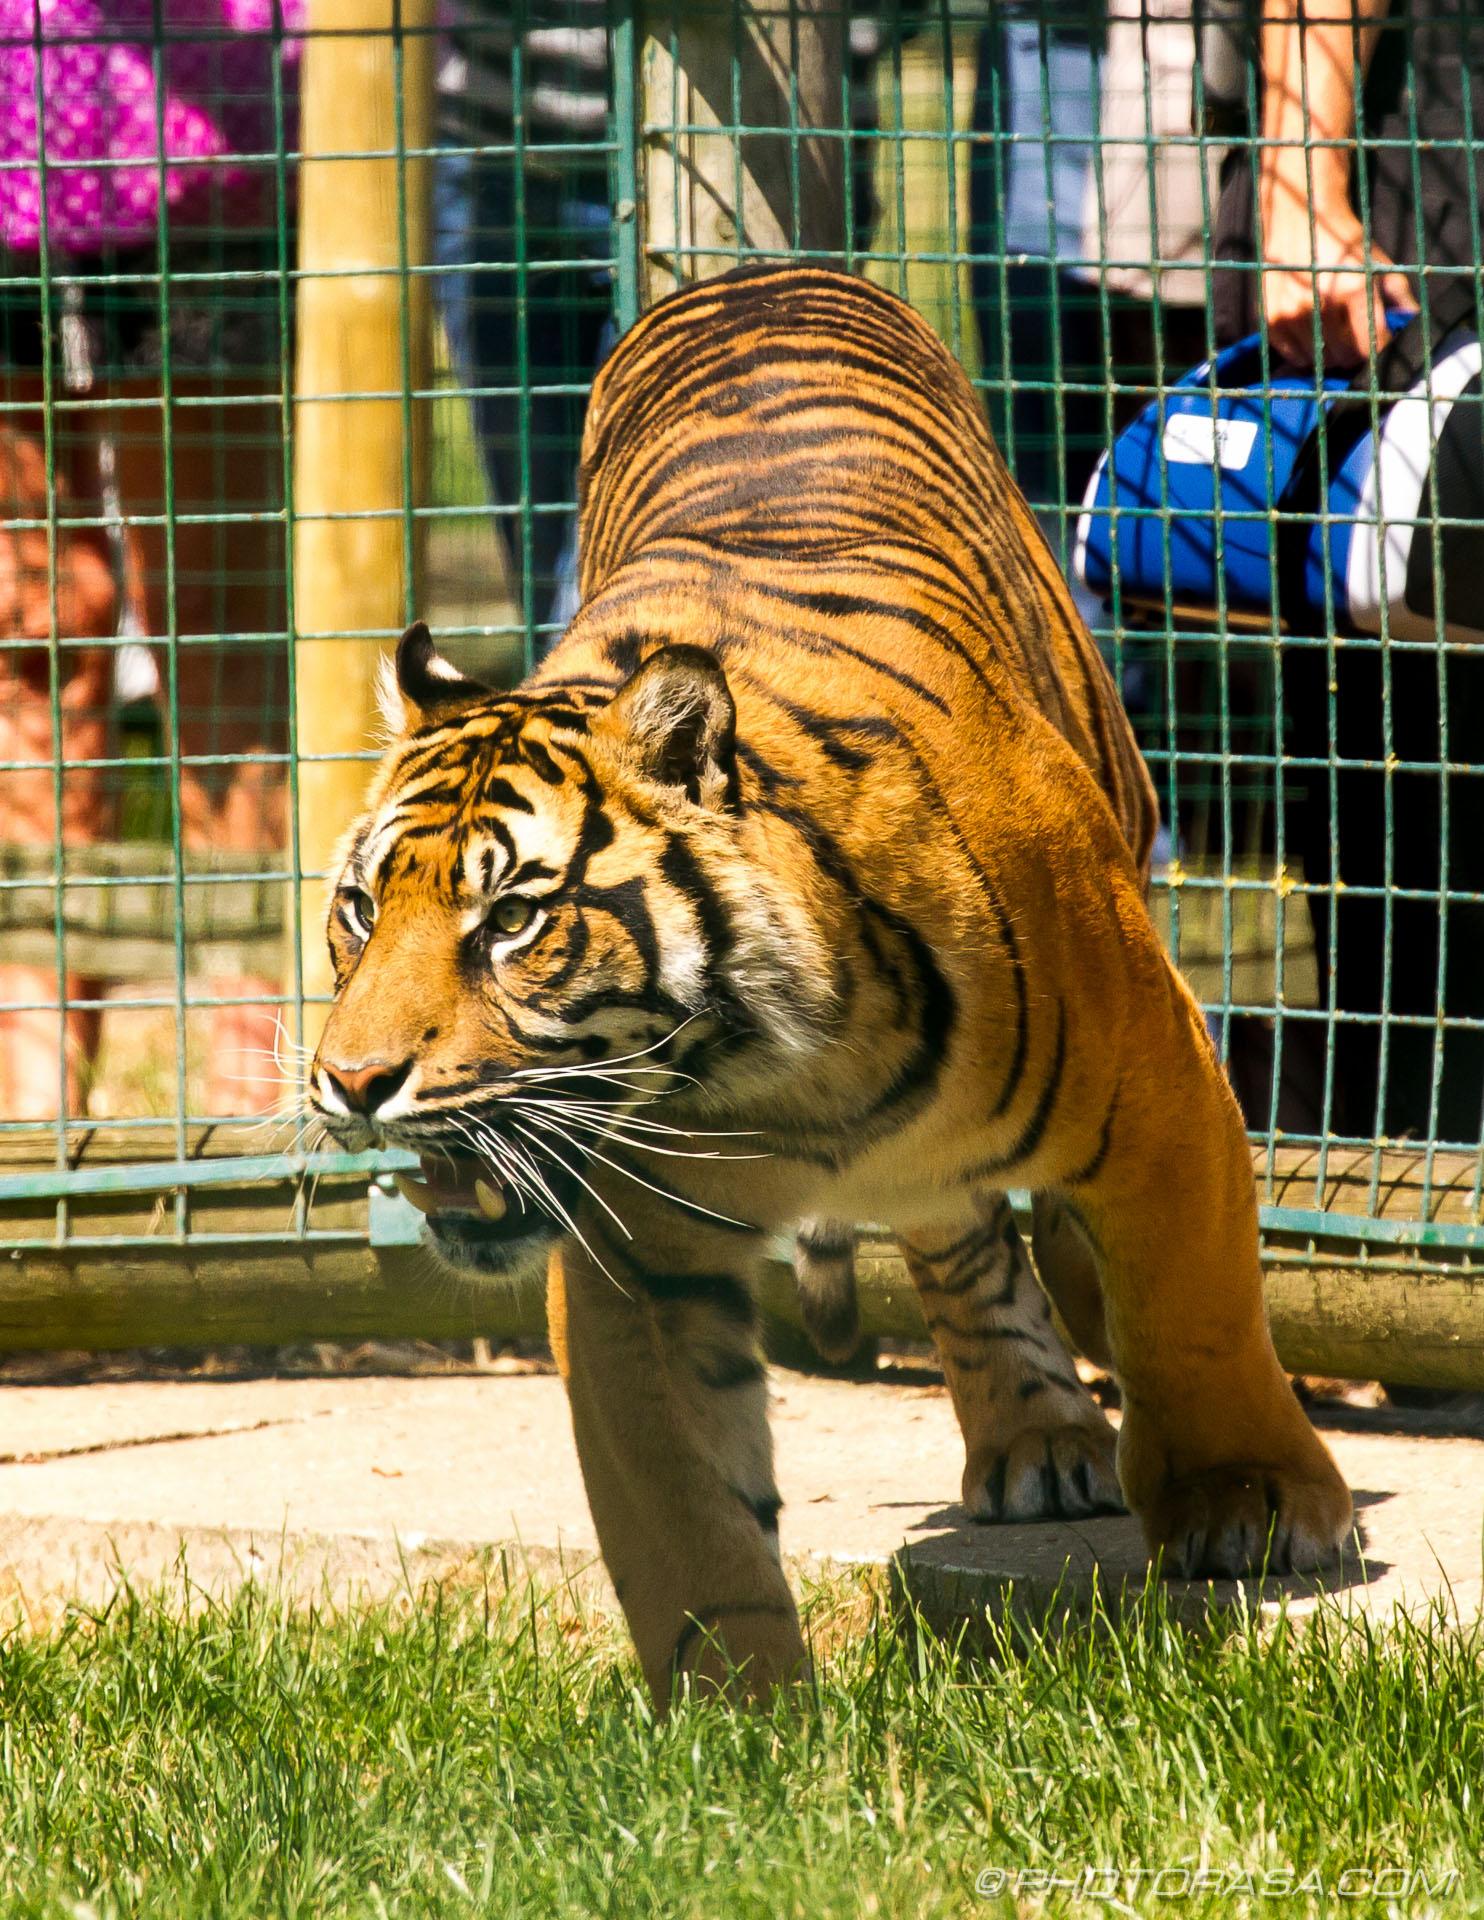 http://photorasa.com/bengal-tiger/tiger-spots-food/